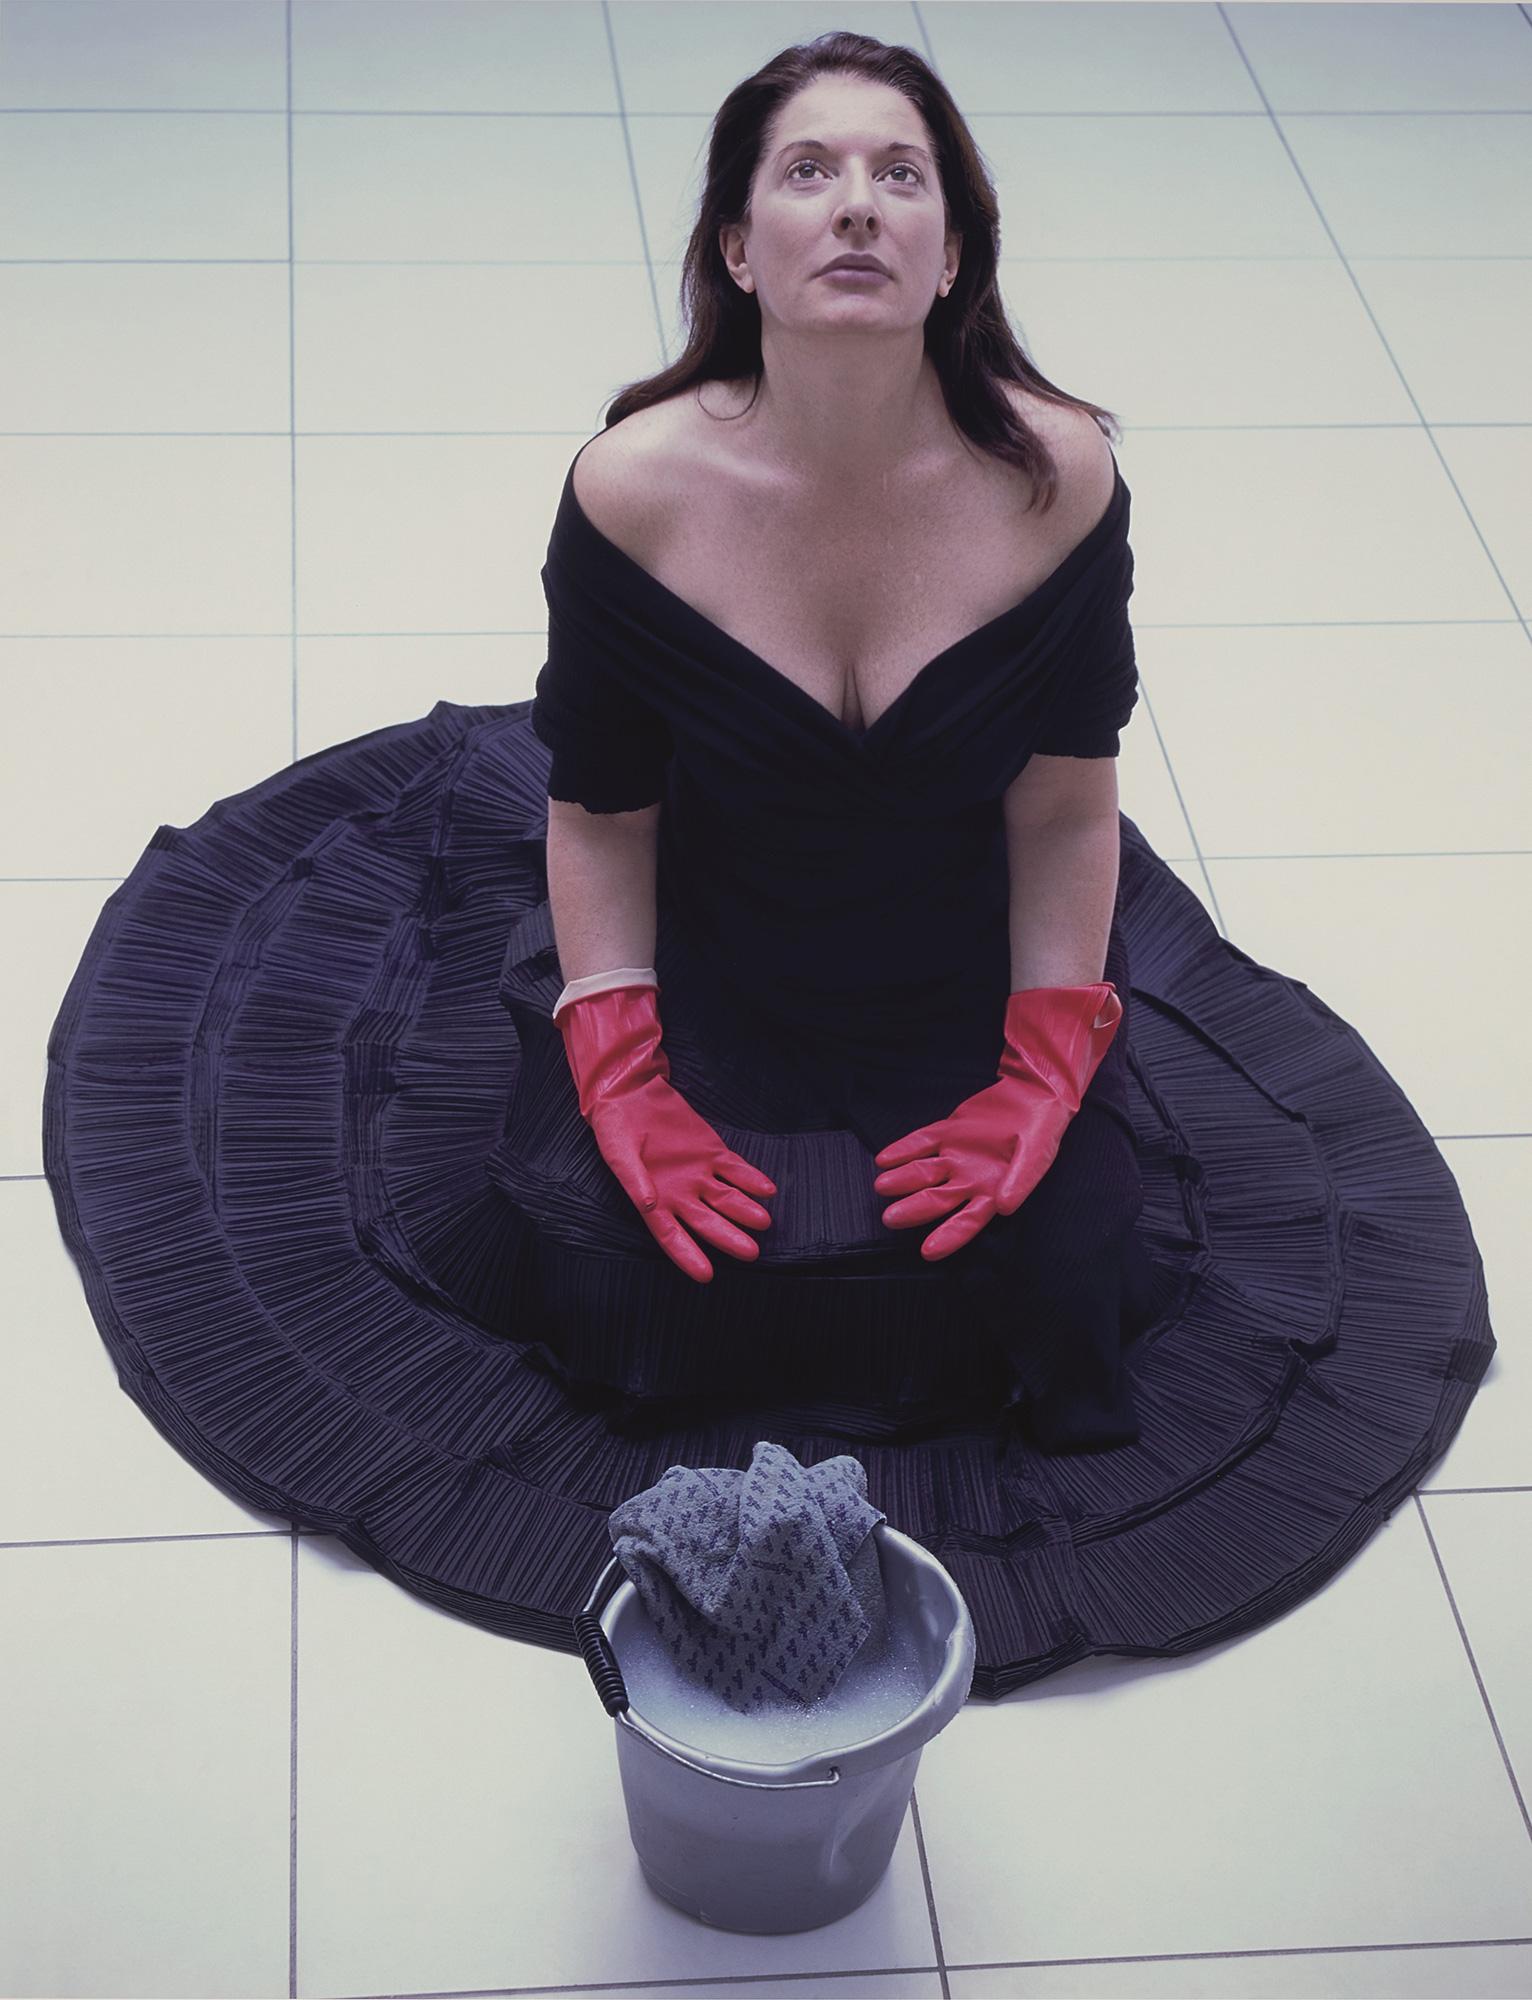 Marina Abramović, Cleaning the Floor, 2004, Courtesy of the Marina Abramović Archives